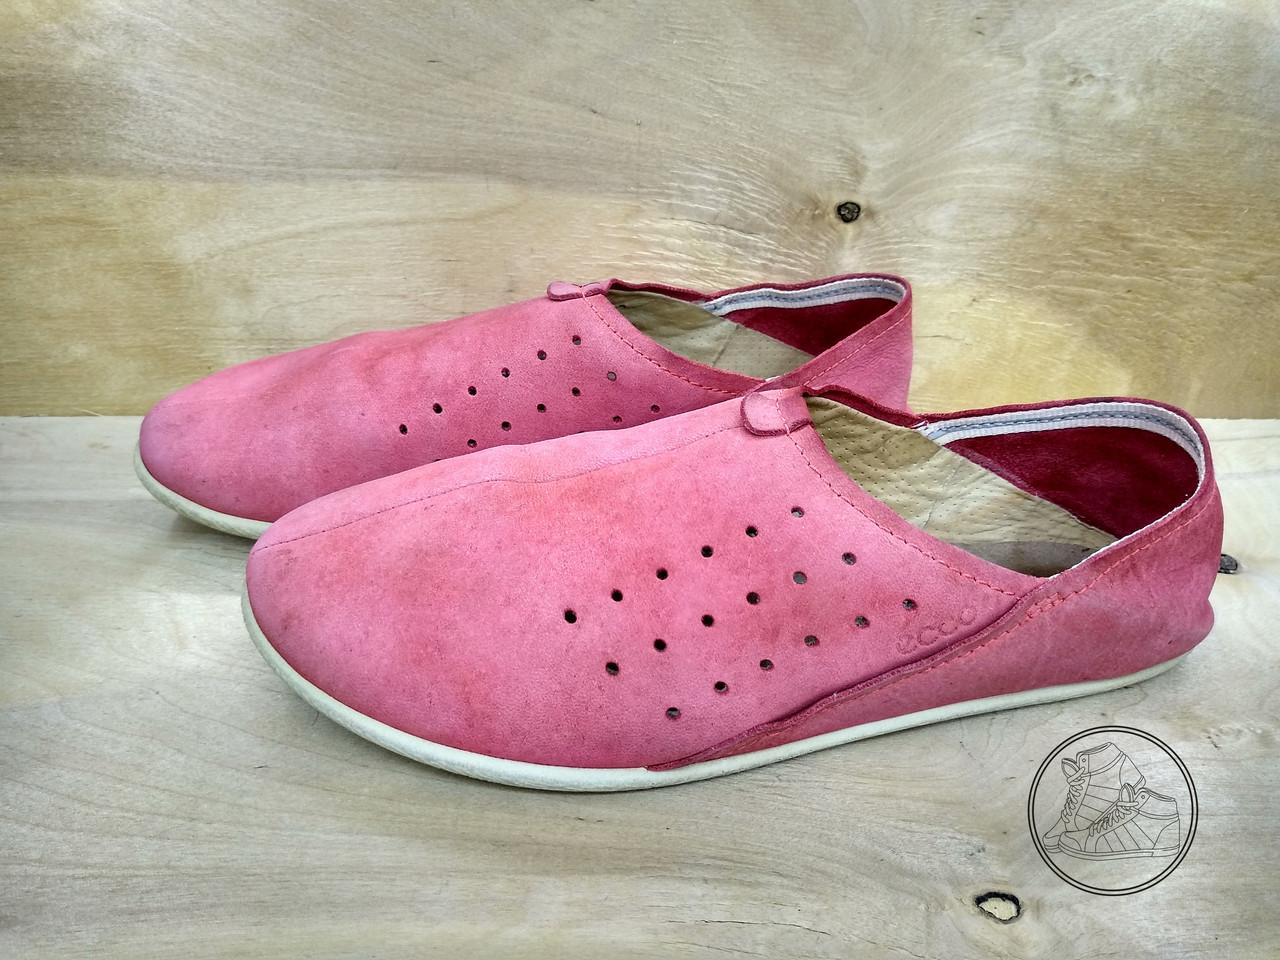 "c710d6169 Эспадрильи Ecco (38 размер) бу - Интернет-магазин обуви из Европы ""Шаг"